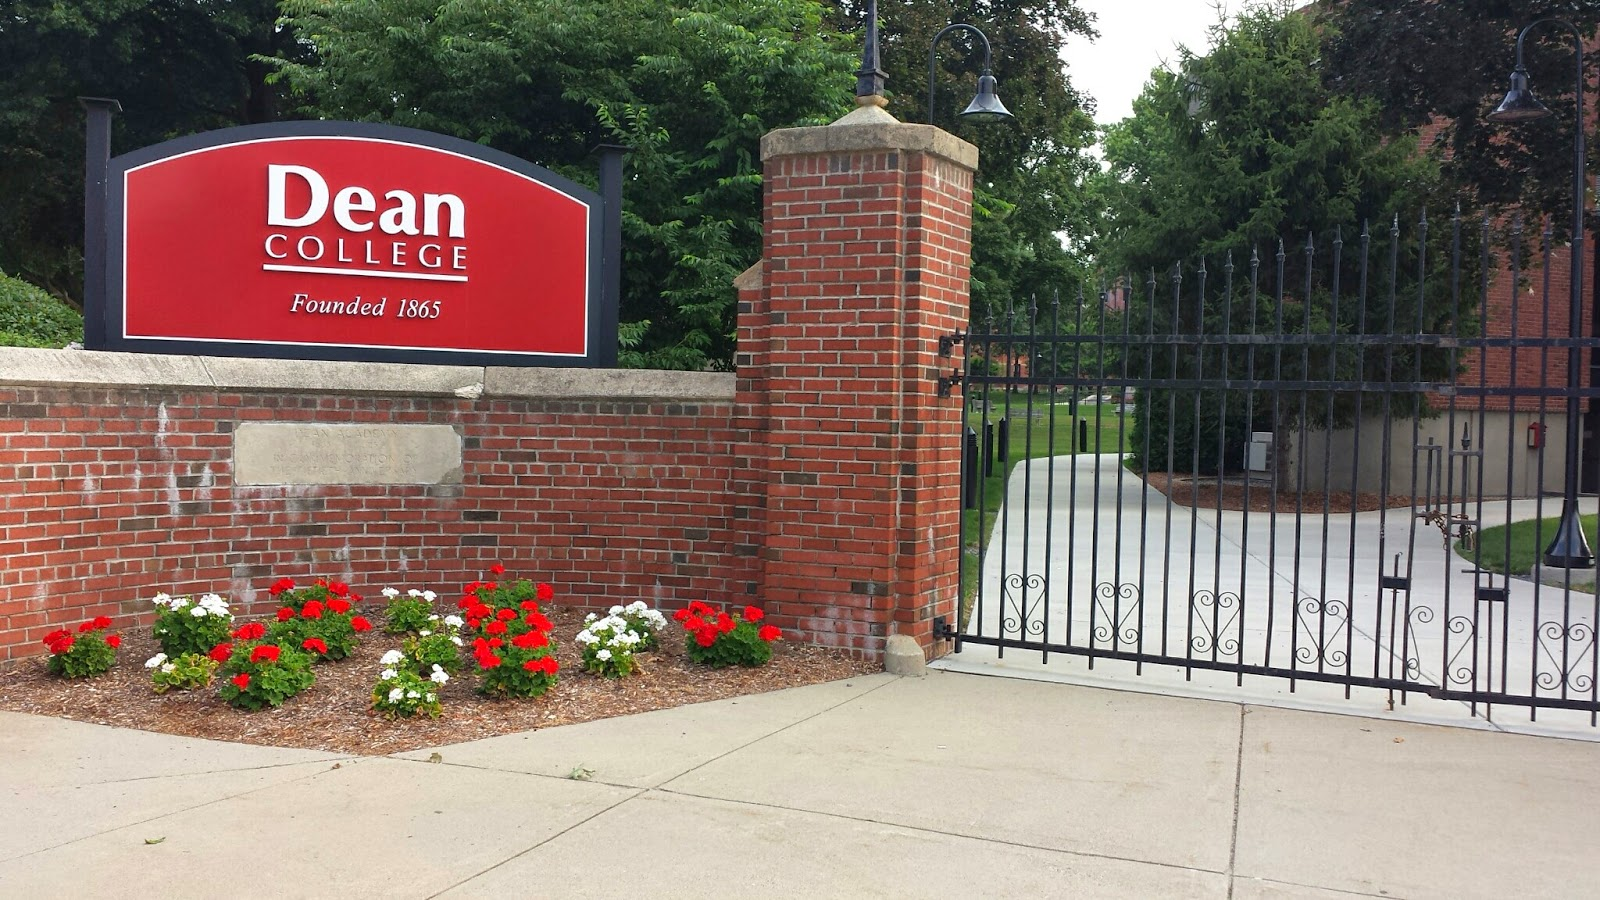 Dean College - 99 Main St, Franklin, MA